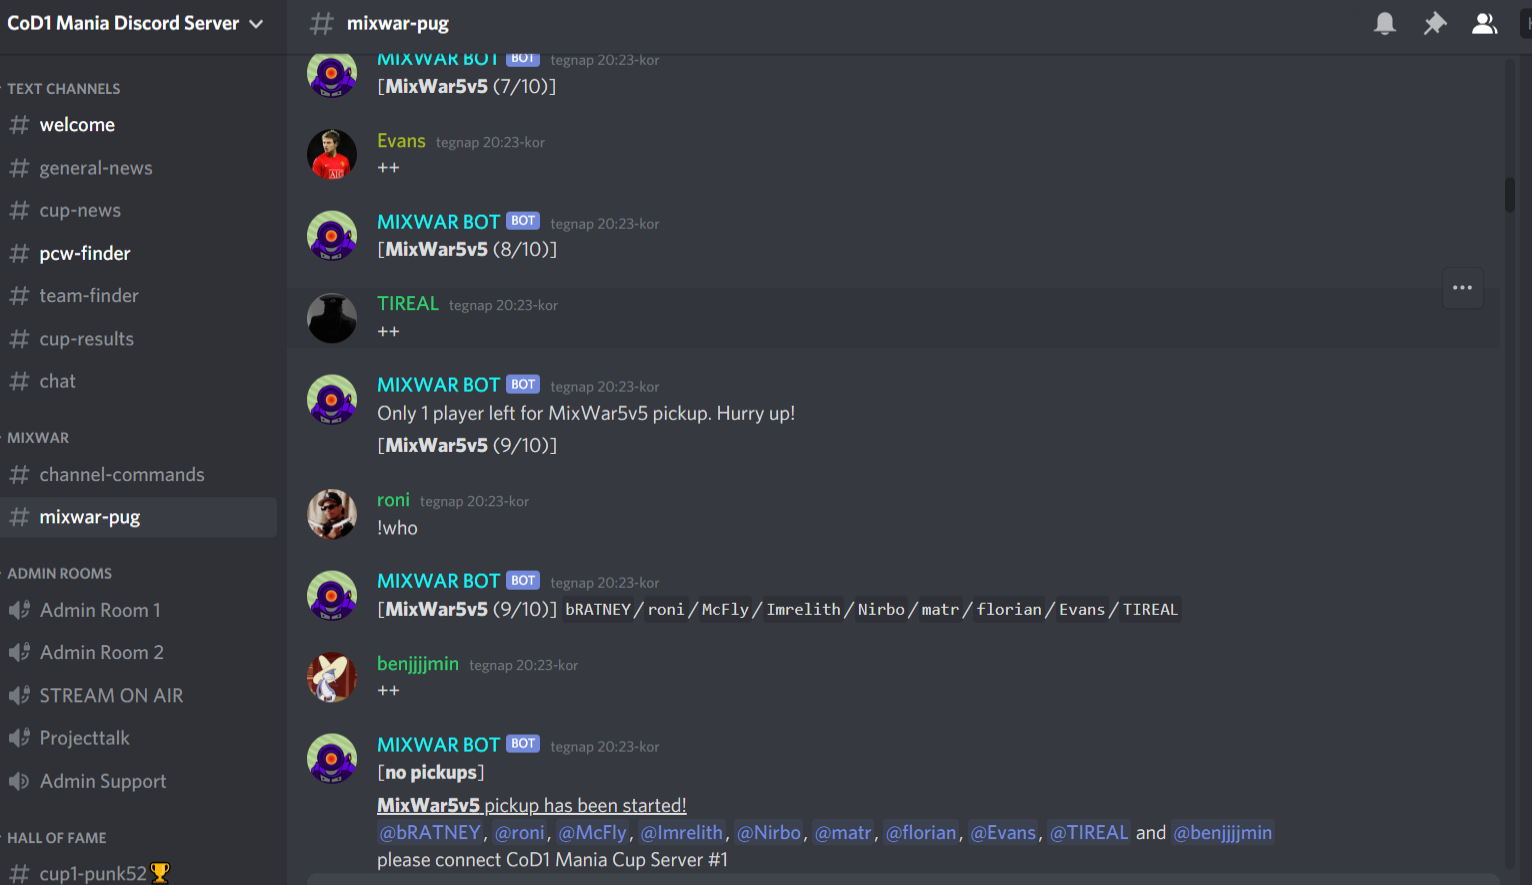 CoD1 Mania mixwars on Discord